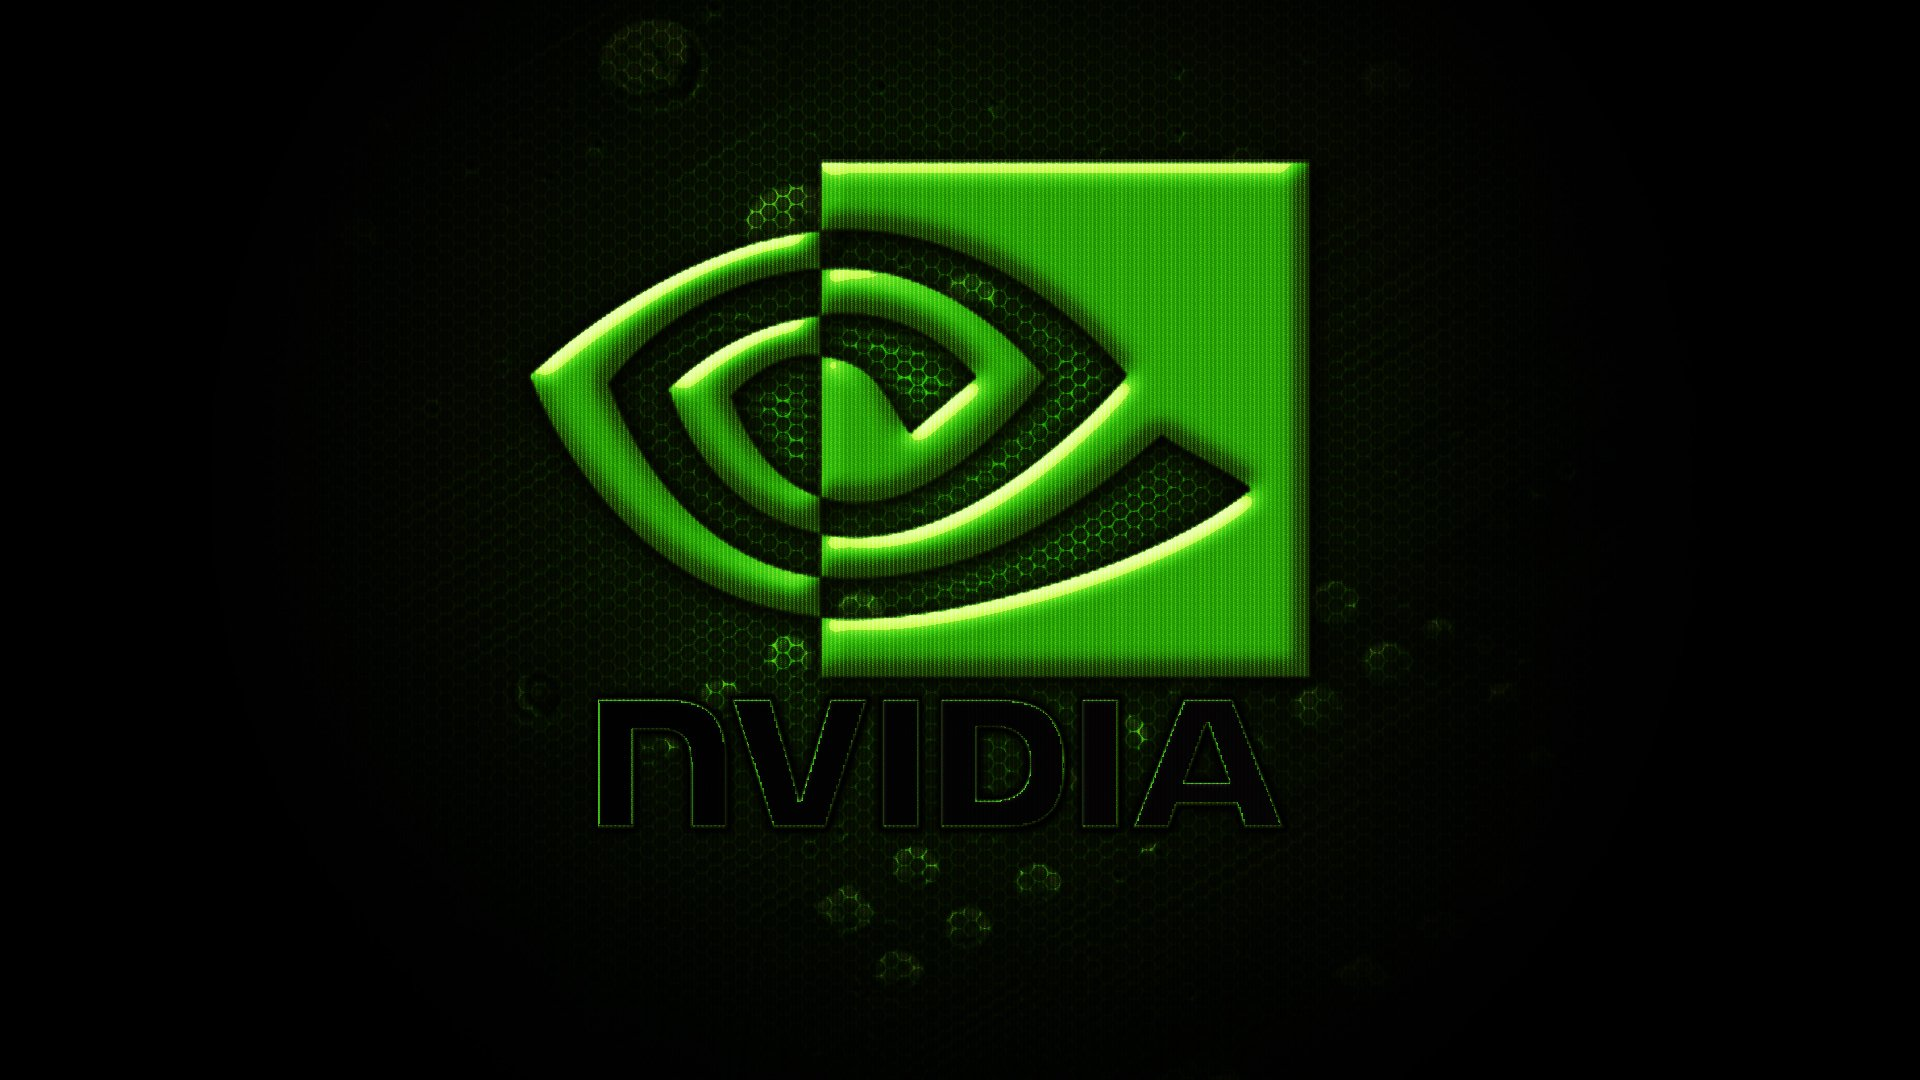 Nvidia geforce gtx gaming computer wallpaper 1920x1080 - 1920x1080 wallpaper nvidia ...